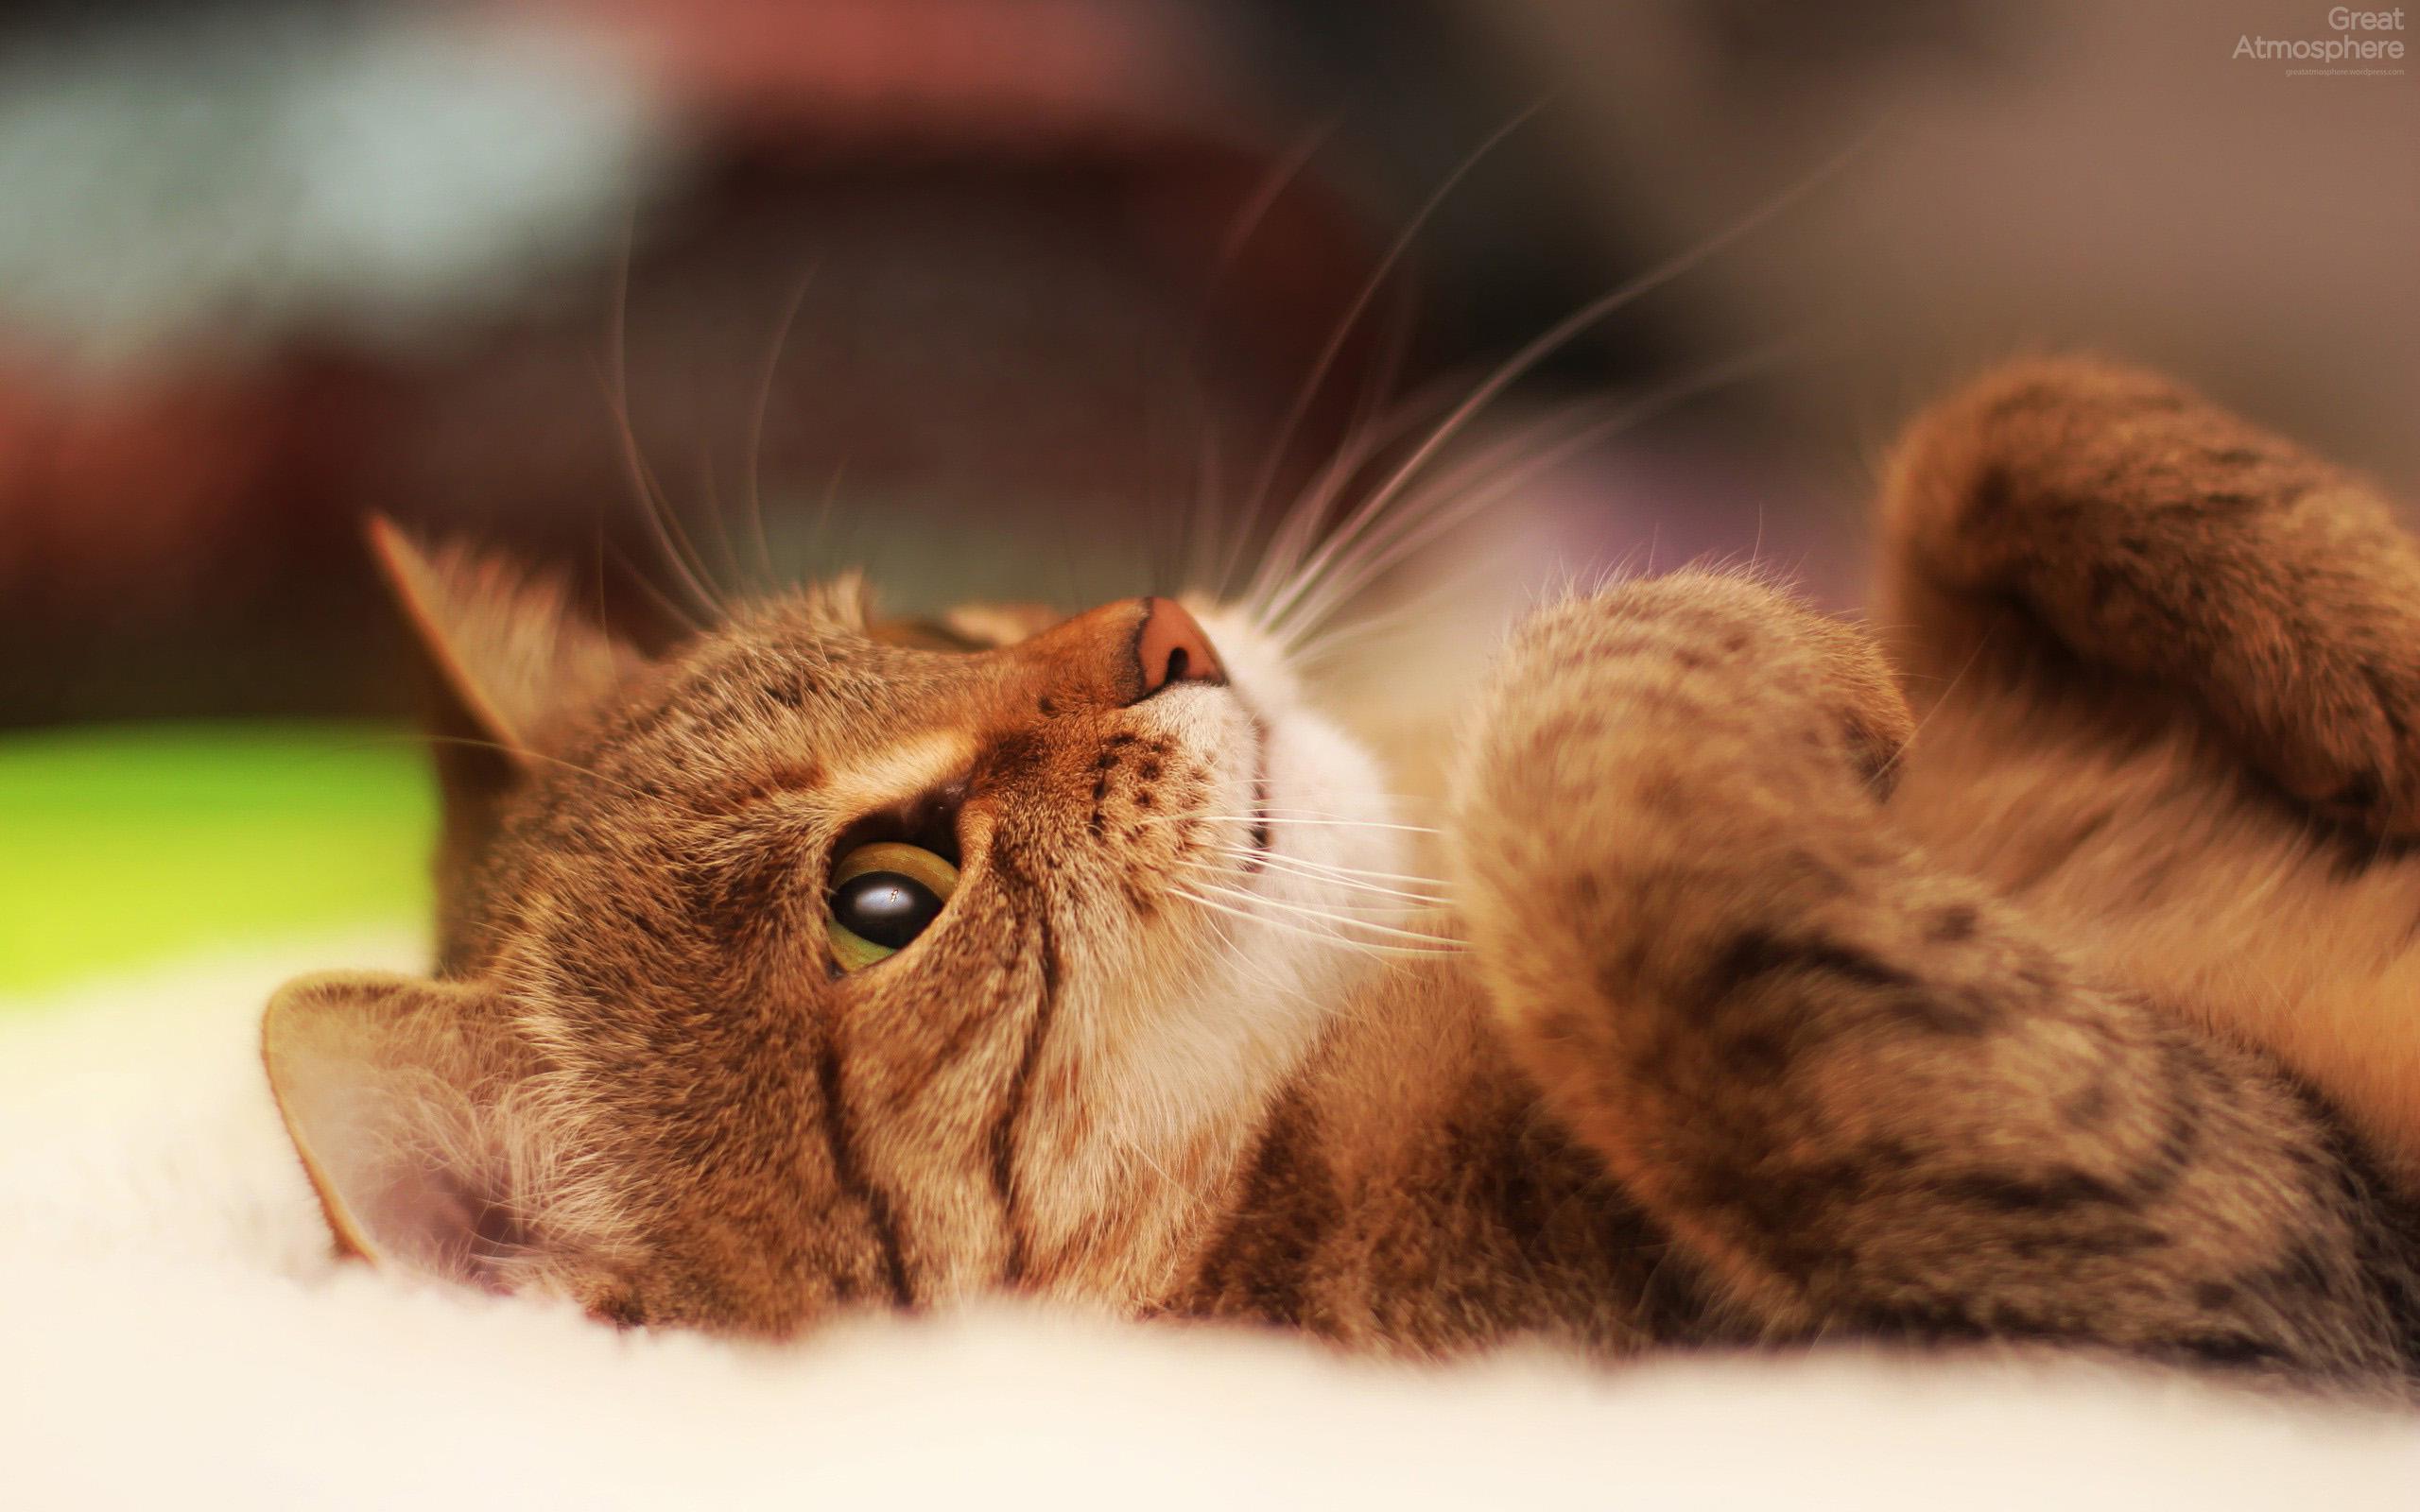 catwhiskersbeautifulanimalphotographygreatatmosphere